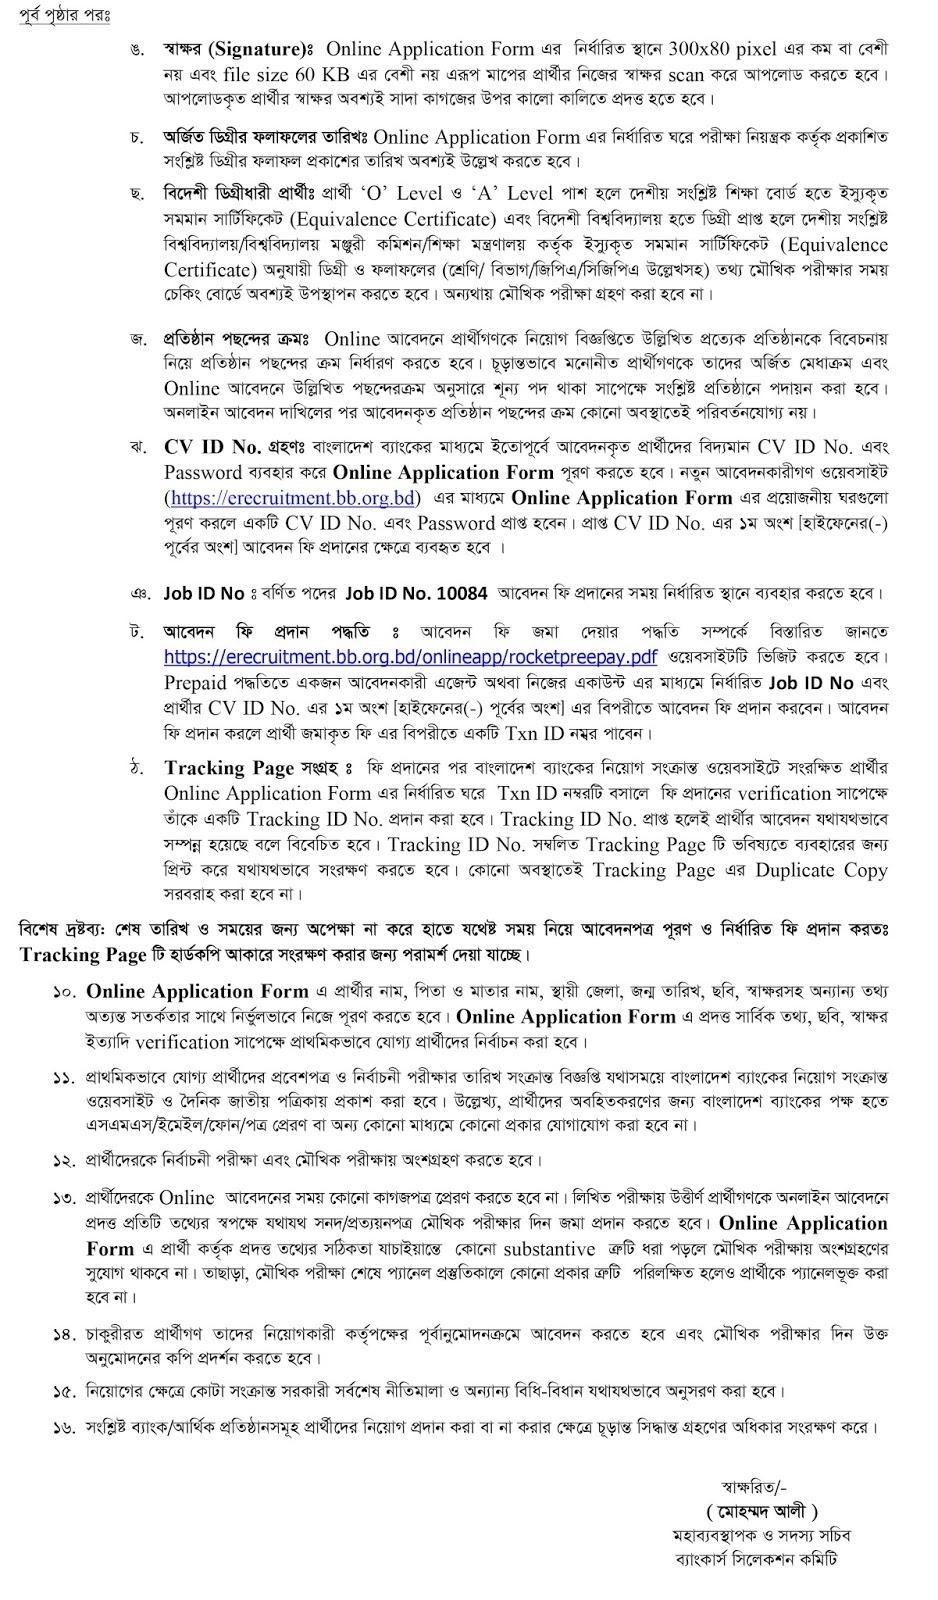 bangladesh bank circular 2019,recent bank job circular in bangladesh,bangladesh bank job circular 2020,bangladesh bank notice,bangladesh bank result,bangladesh bank exam notice,bangladesh bank exam date,bangladesh bank ad circular,বাংলাদেশ ব্যাংকে নিয়োগ ২০২০,বাংলাদেশ ব্যাংকে নিয়োগ,চাকরির খবর ২০২০,চাকরির খবর সরকারি,চাকরির খবর সরকারী ২০২০,চাকরির খবর ২০২০,চাকরির পত্রিকা আজকের,আজকের চাকরির খবর,আজকের চাকরির পত্রিকা, চাকরির পত্রিকা, বাংলাদেশ ব্যাংক নিয়োগ,বাংলাদেশ ব্যাংক নিয়োগ 2019,বাংলাদেশ ব্যাংক নিয়োগ বিজ্ঞপ্তি,বাংলাদেশ ব্যাংক নিয়োগ বিজ্ঞপ্তি ২০২০,বাংলাদেশ ব্যাংকে চাকরি, বাংলাদেশ ব্যাংকে নতুন নিয়োগ বিজ্ঞপ্তি,